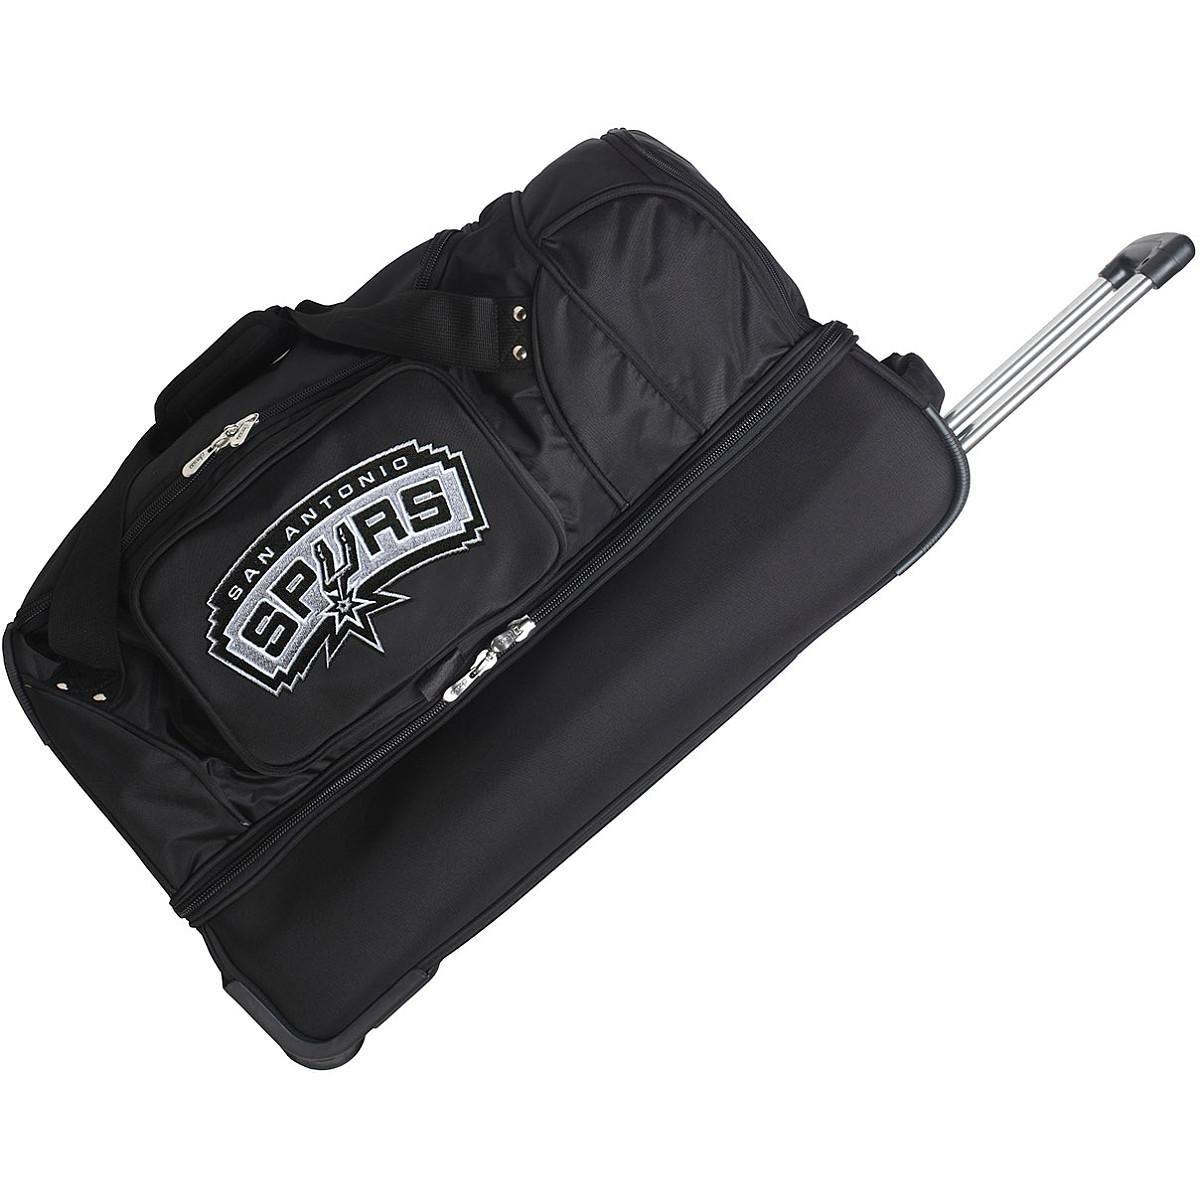 DENCO SAN ANTONIO SPURS 27'' 2-WHEELED DROP BOTTOM DUFFEL by Denco Luggage 1048749